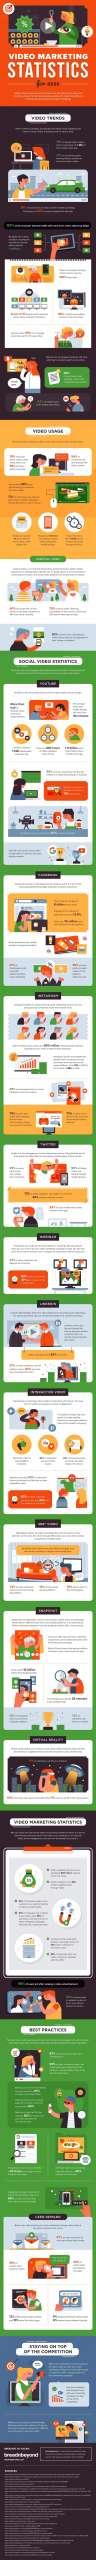 Video-Marketing-Statistics-scaled